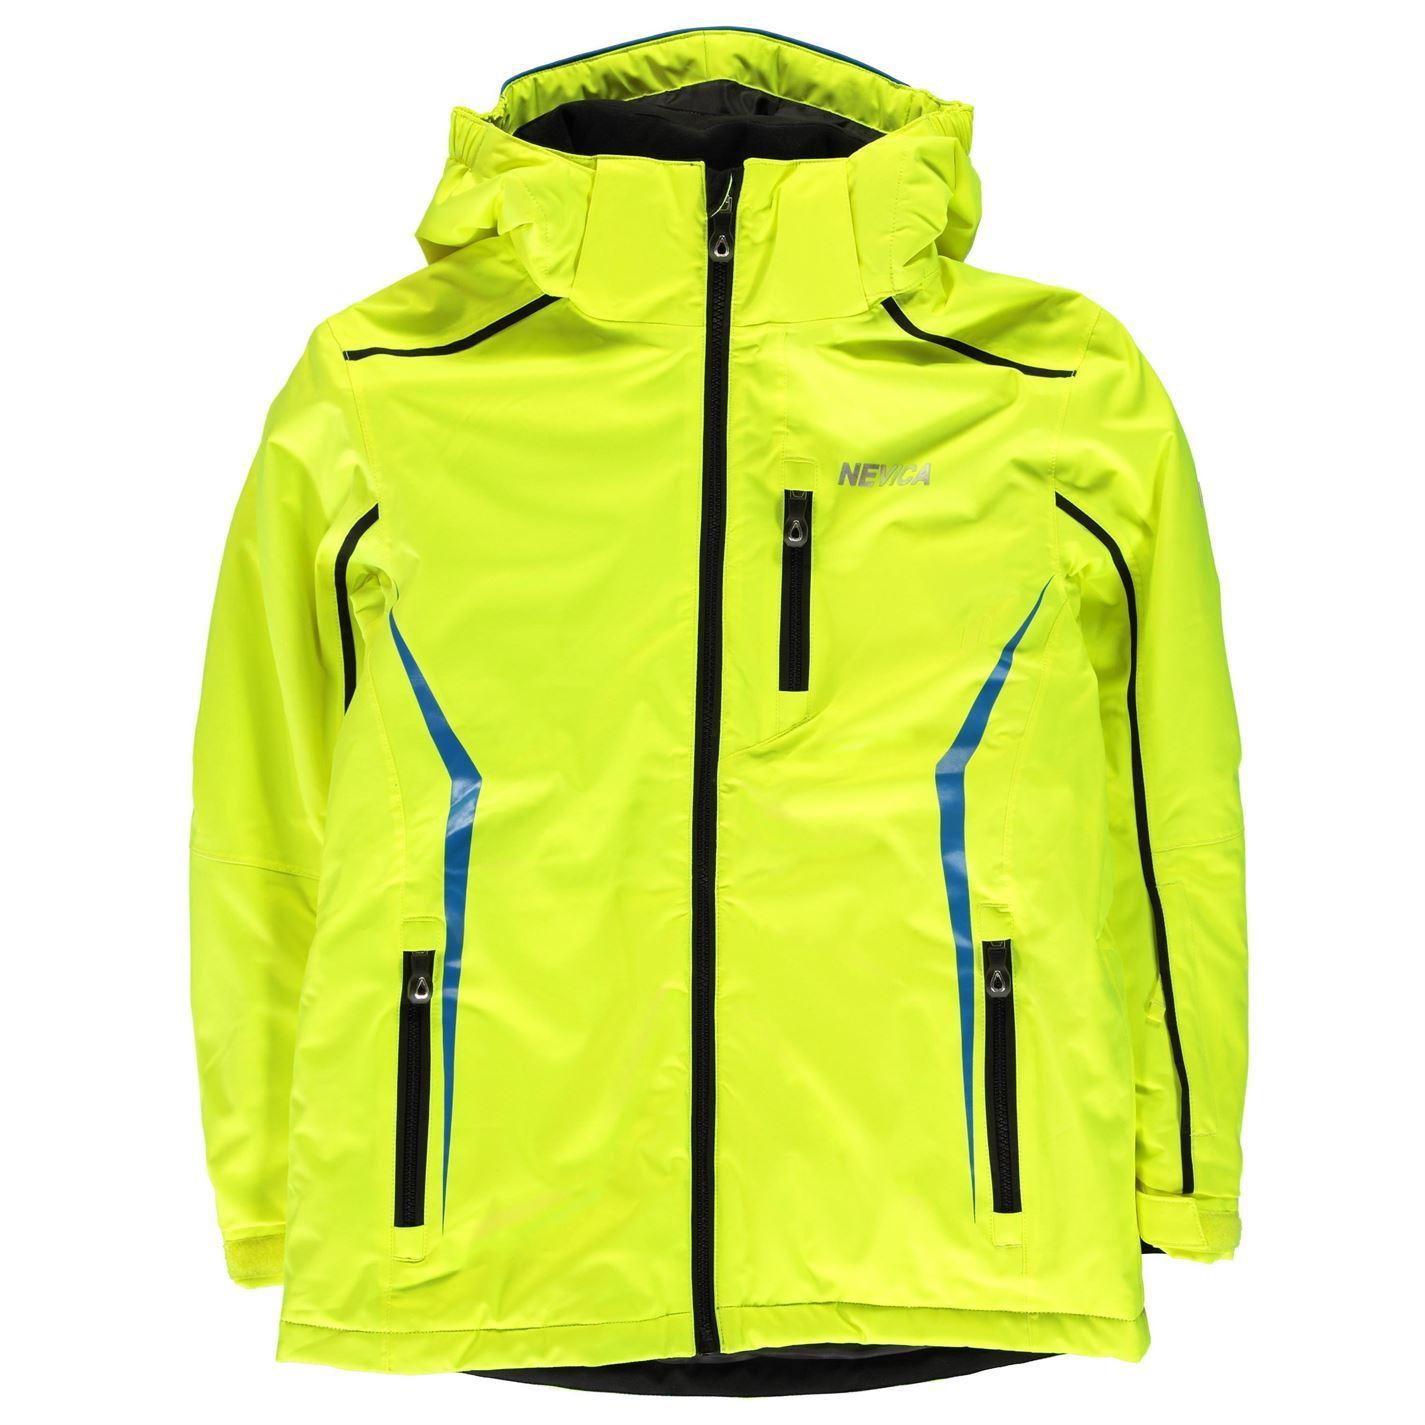 ... Nevica Meribel Jacket Junior Boys Snow Coat Skiing Outerwear ... 14f6c4ab003